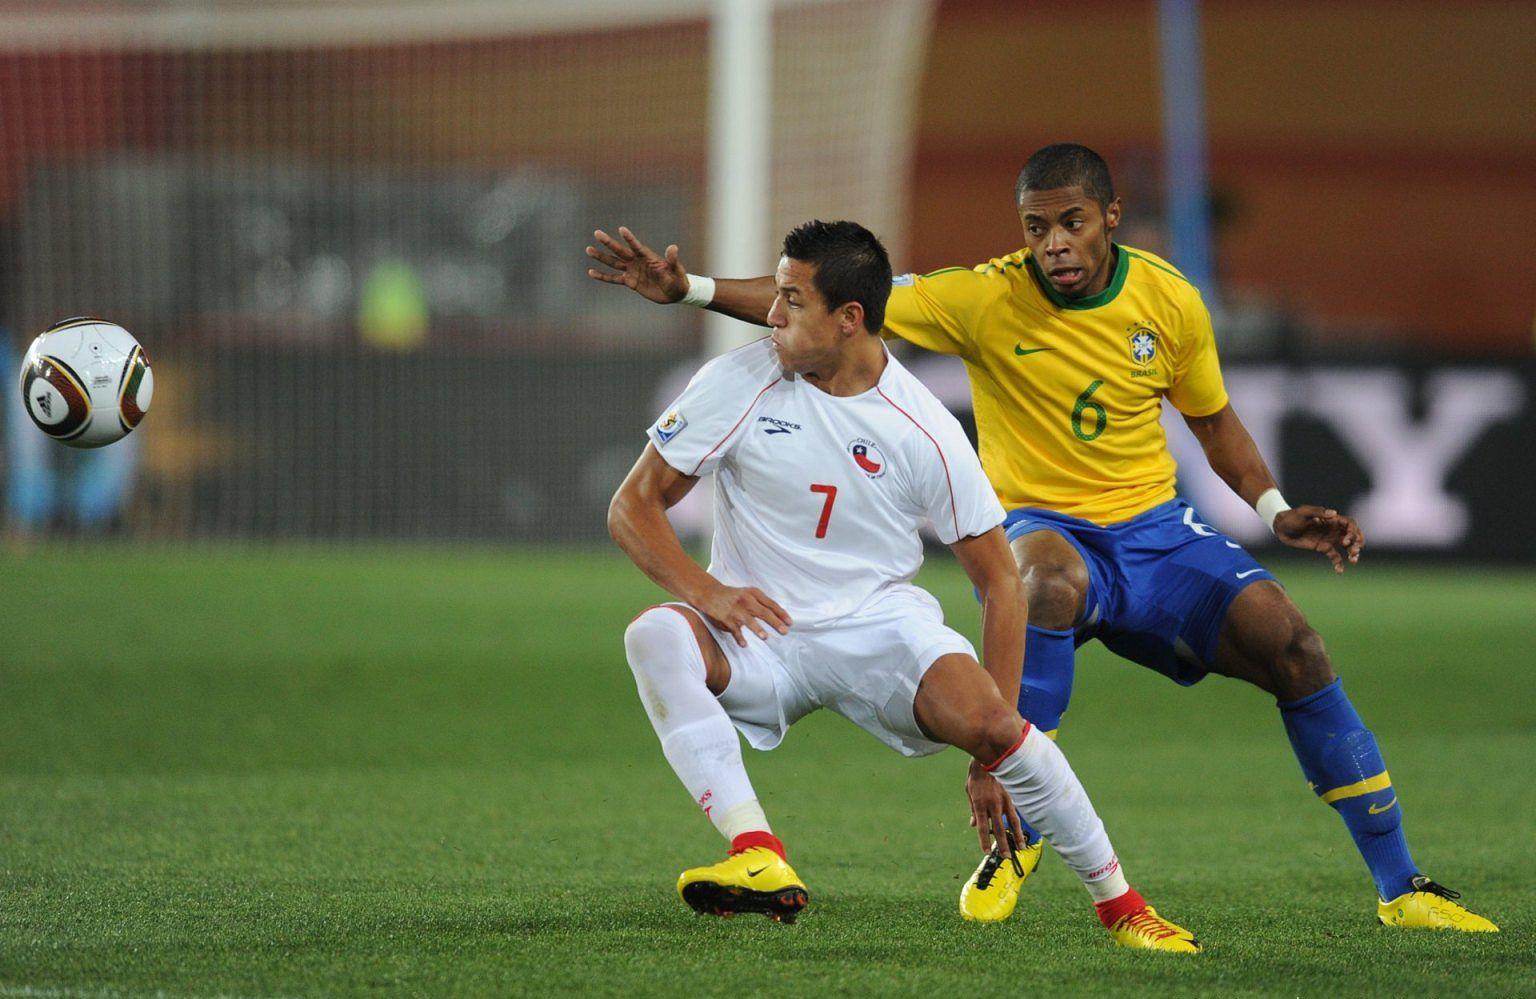 Partidos de la Roja: [28/06/2010] Brasil-Chile - 3:0